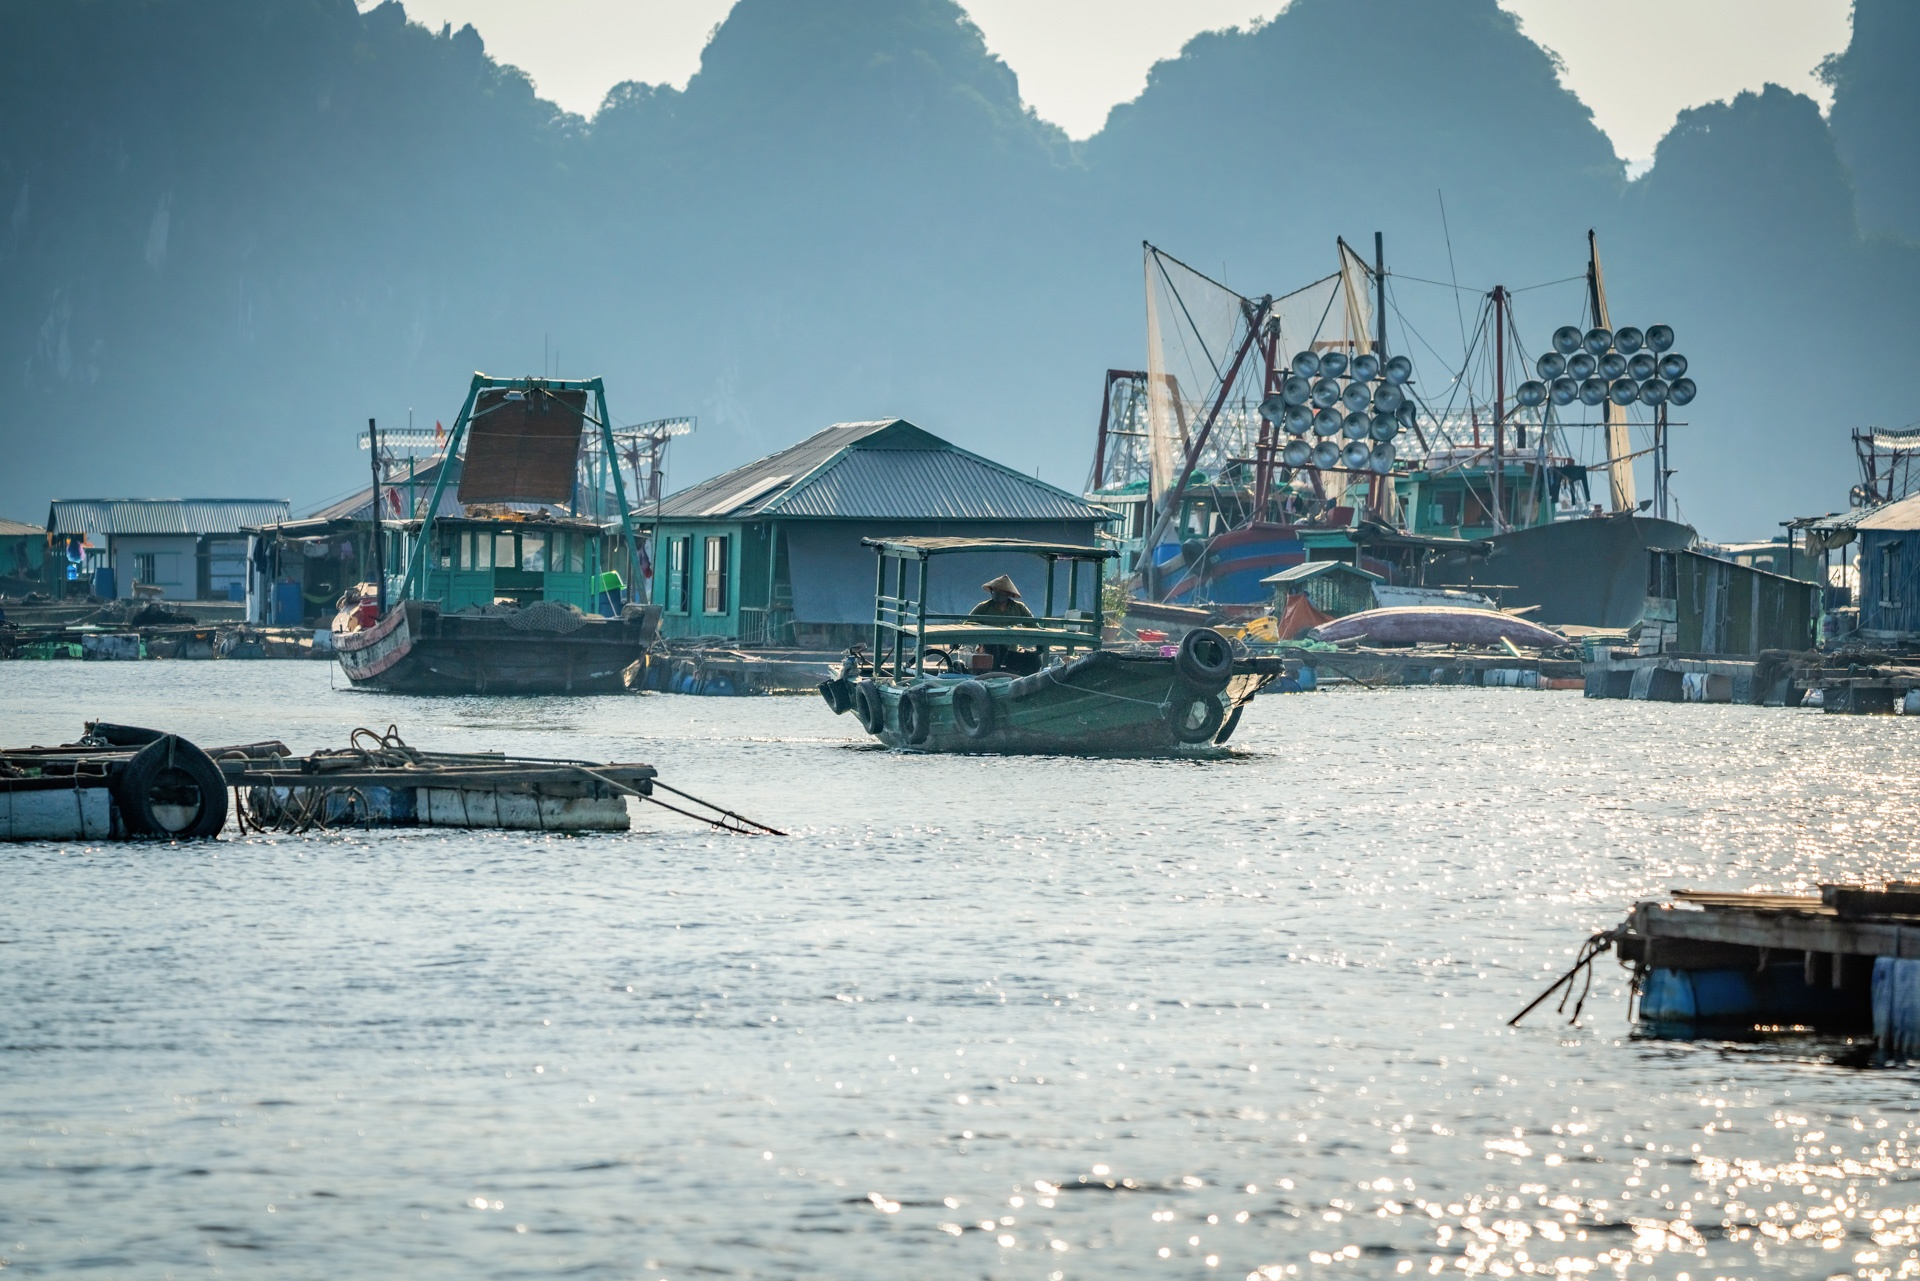 Nhung lang chai du lich o hai vinh dep nhat Quang Ninh hinh anh 30